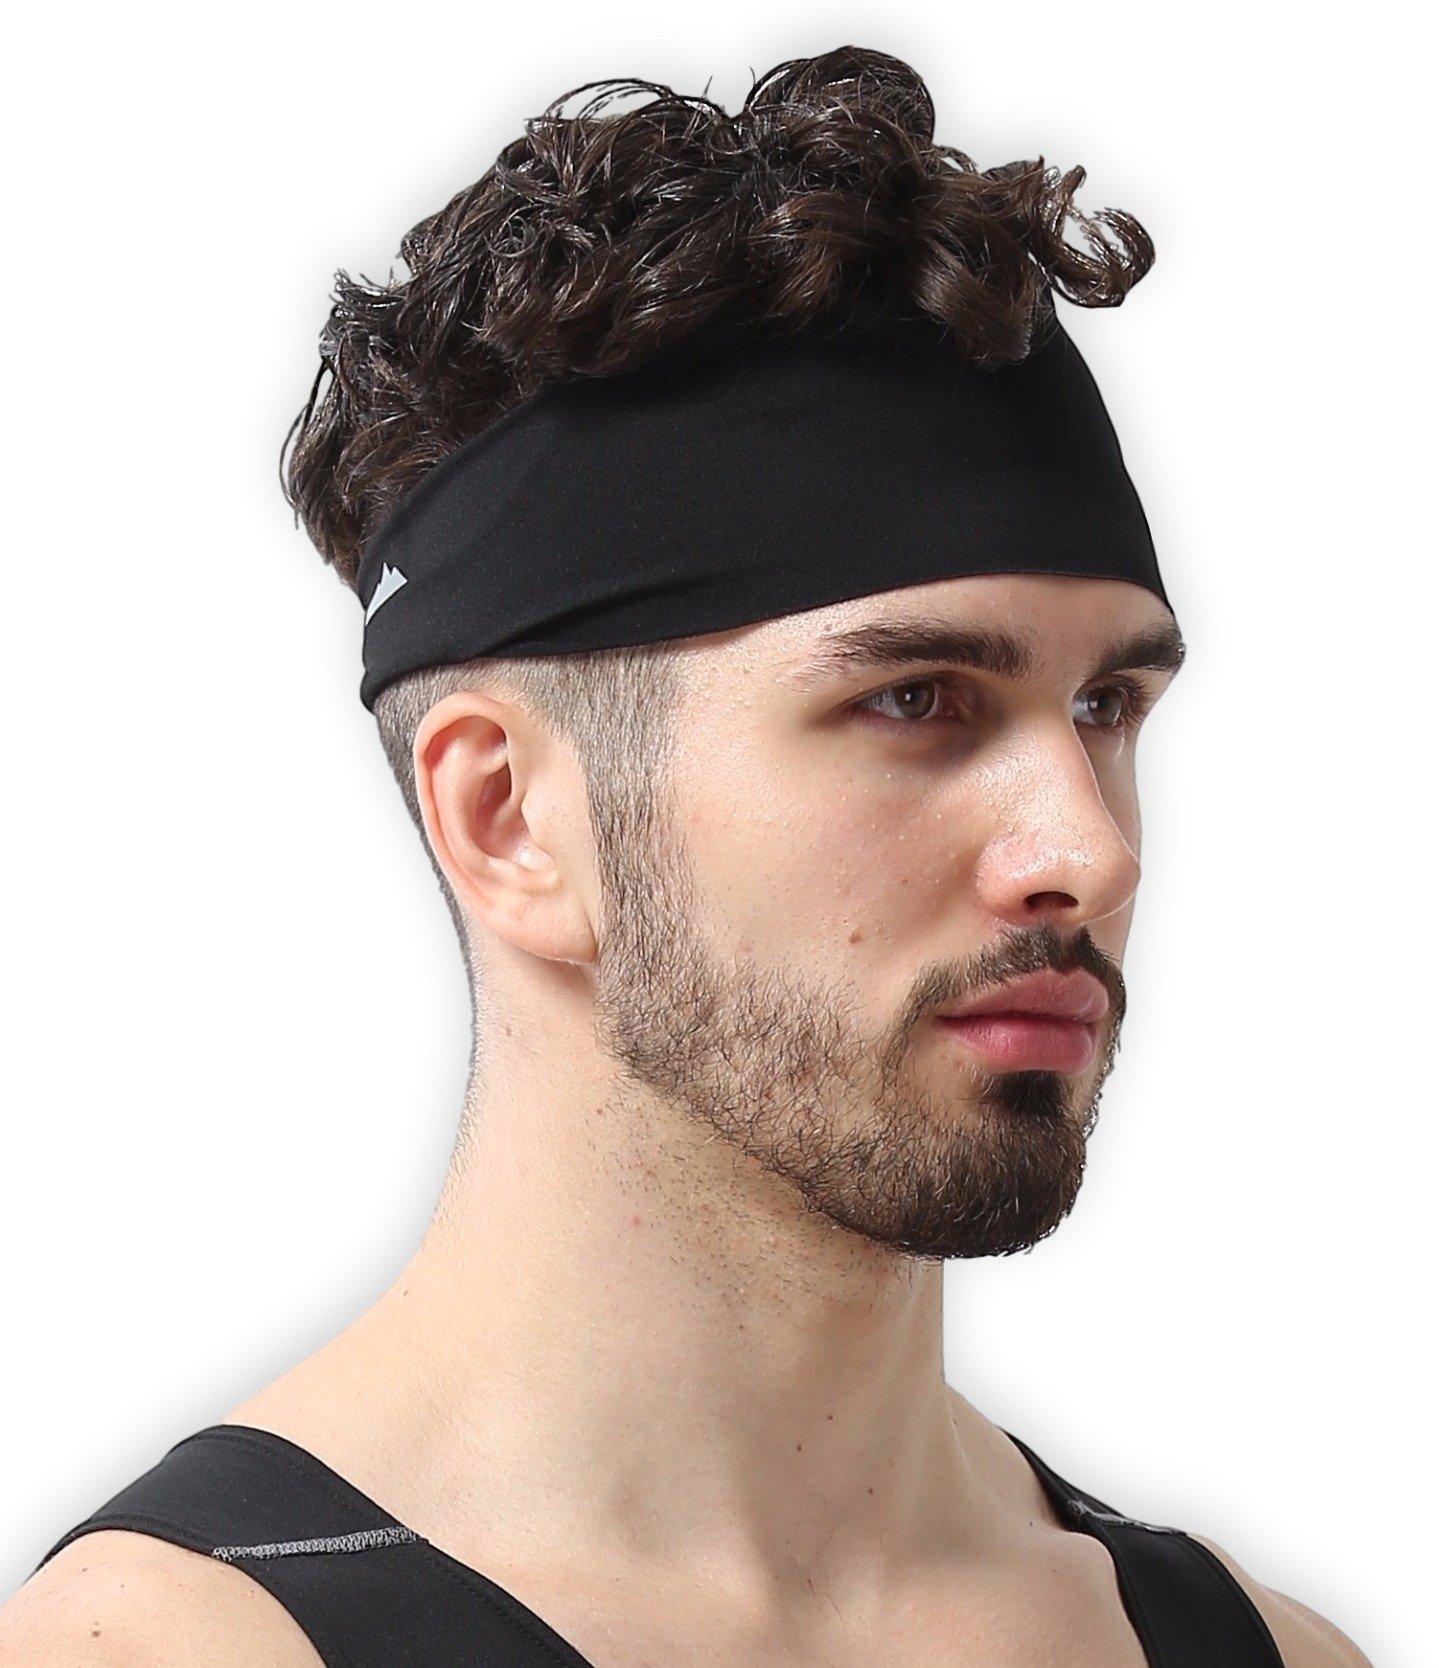 Details about Hair Head Band Sweatband Headband Stretch Mens Wrap Elastic  Sports Men Thin Gym 3342990239e